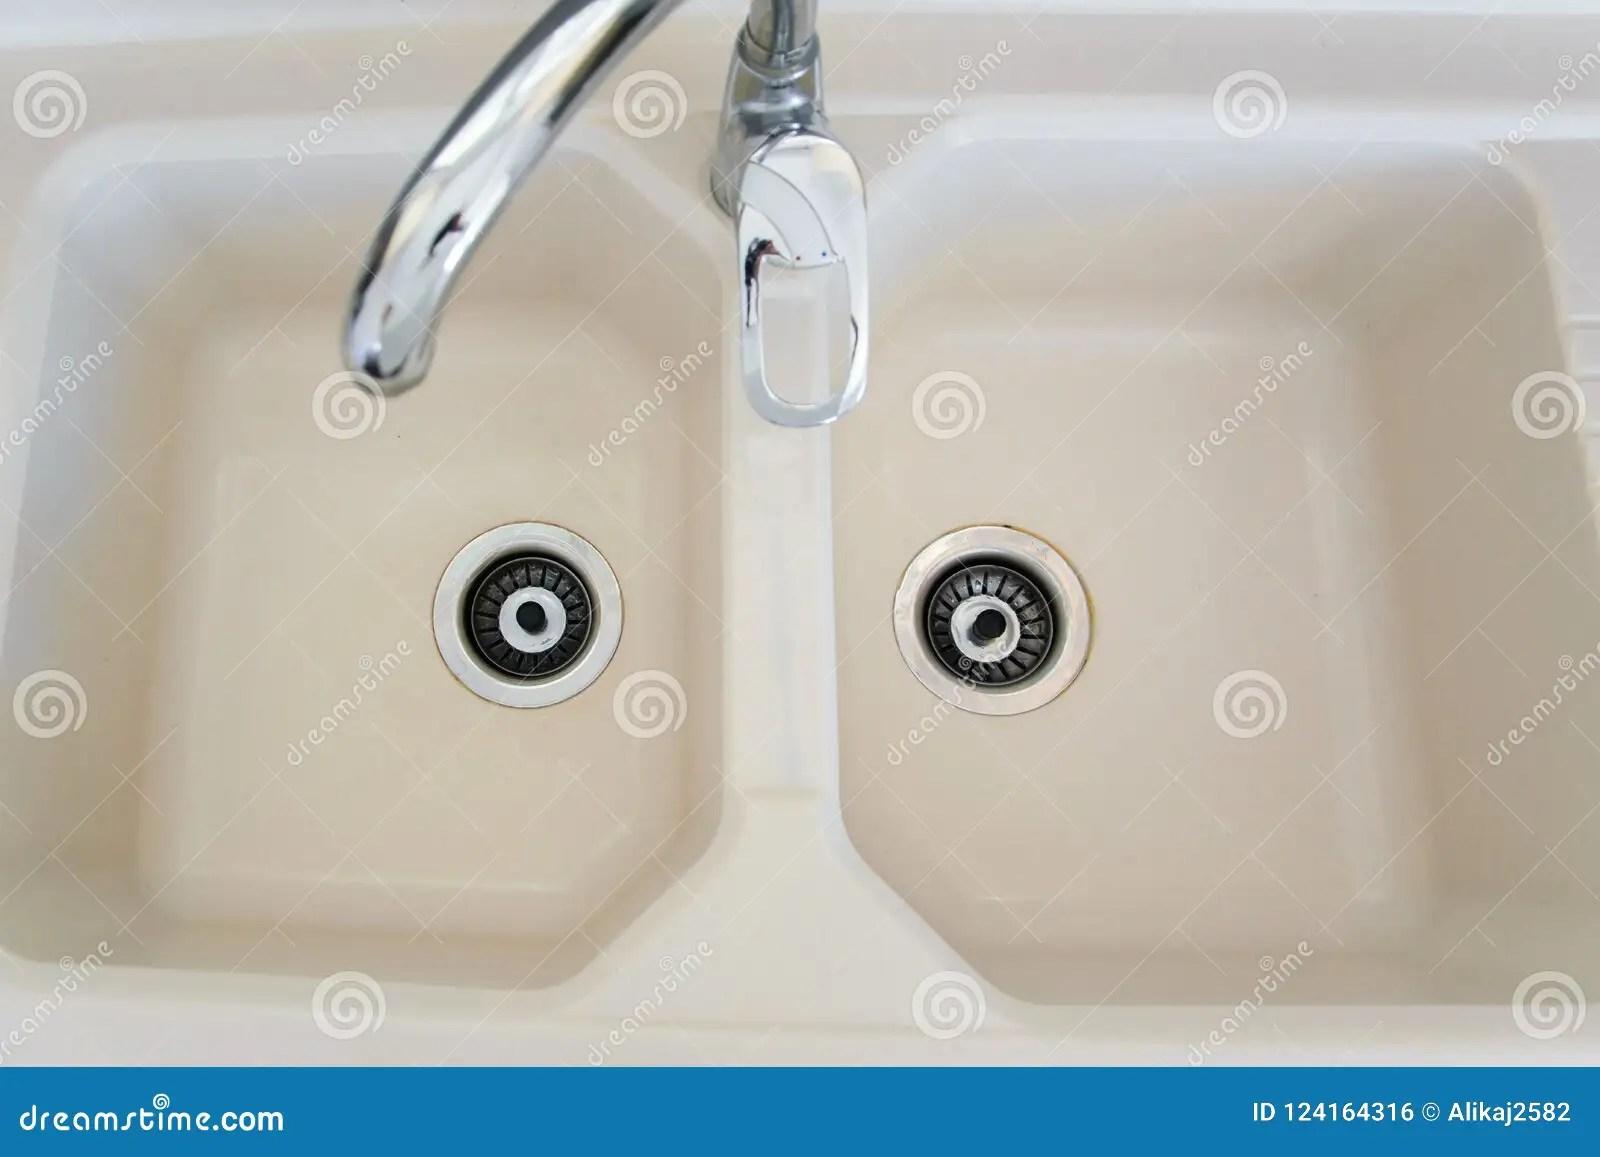 ceramic kitchen sink tile floor 陶瓷厨房水槽顶视图库存照片 图片包括有背包 bastien 镀铬物 设备 陶瓷厨房水槽顶视图